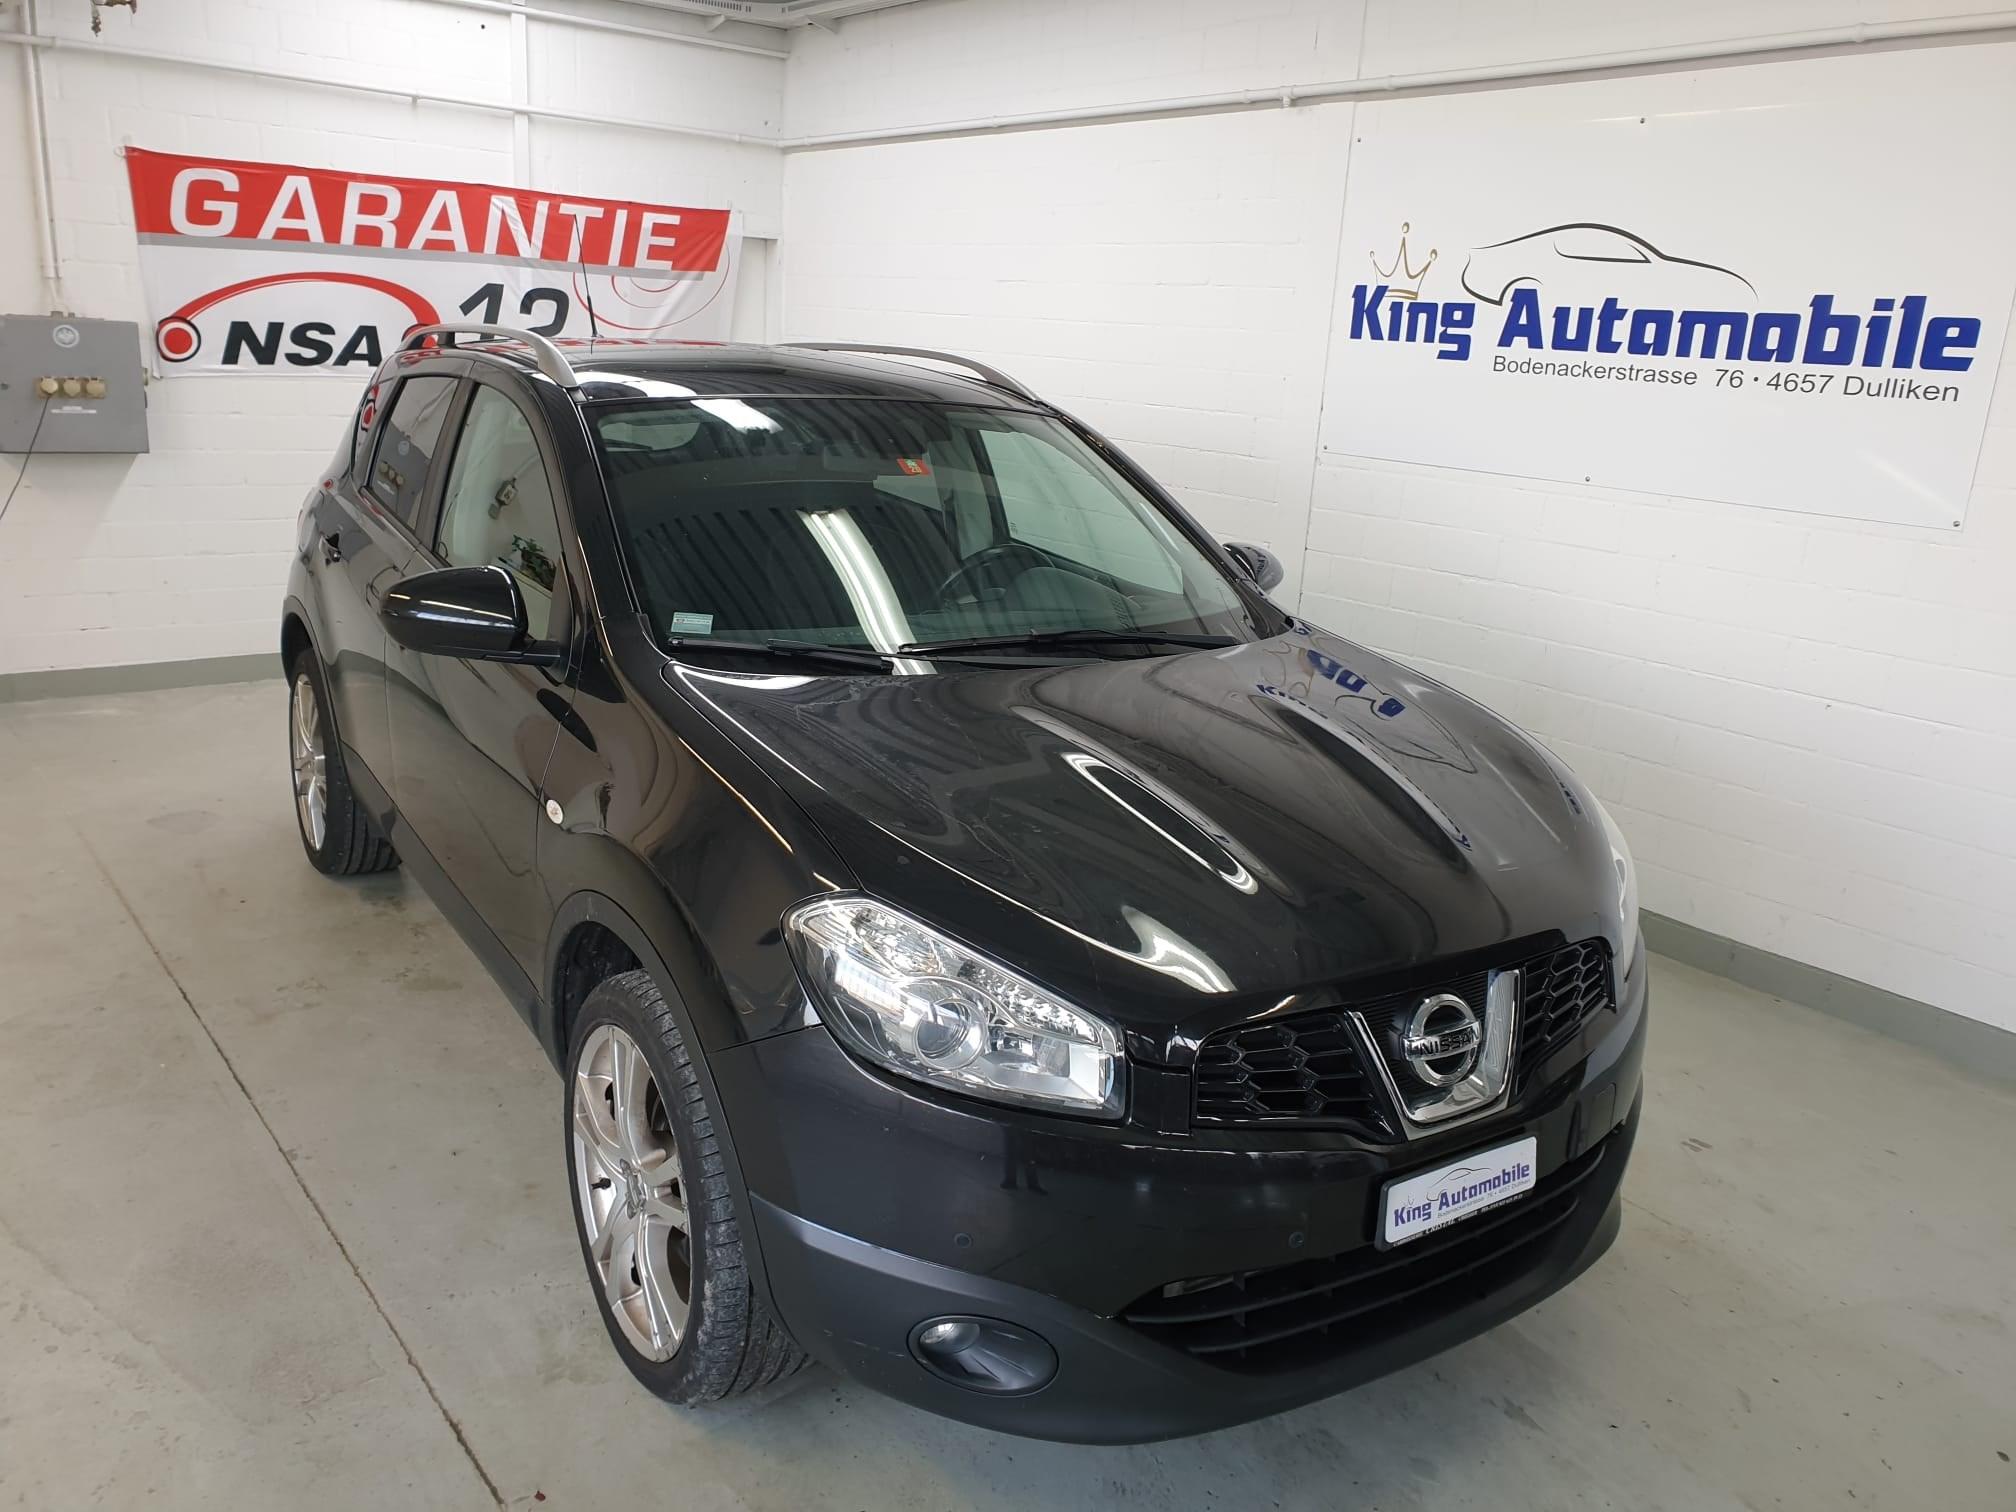 suv Nissan Qashqai 2.0 dCi 4WD i-Way Automatic